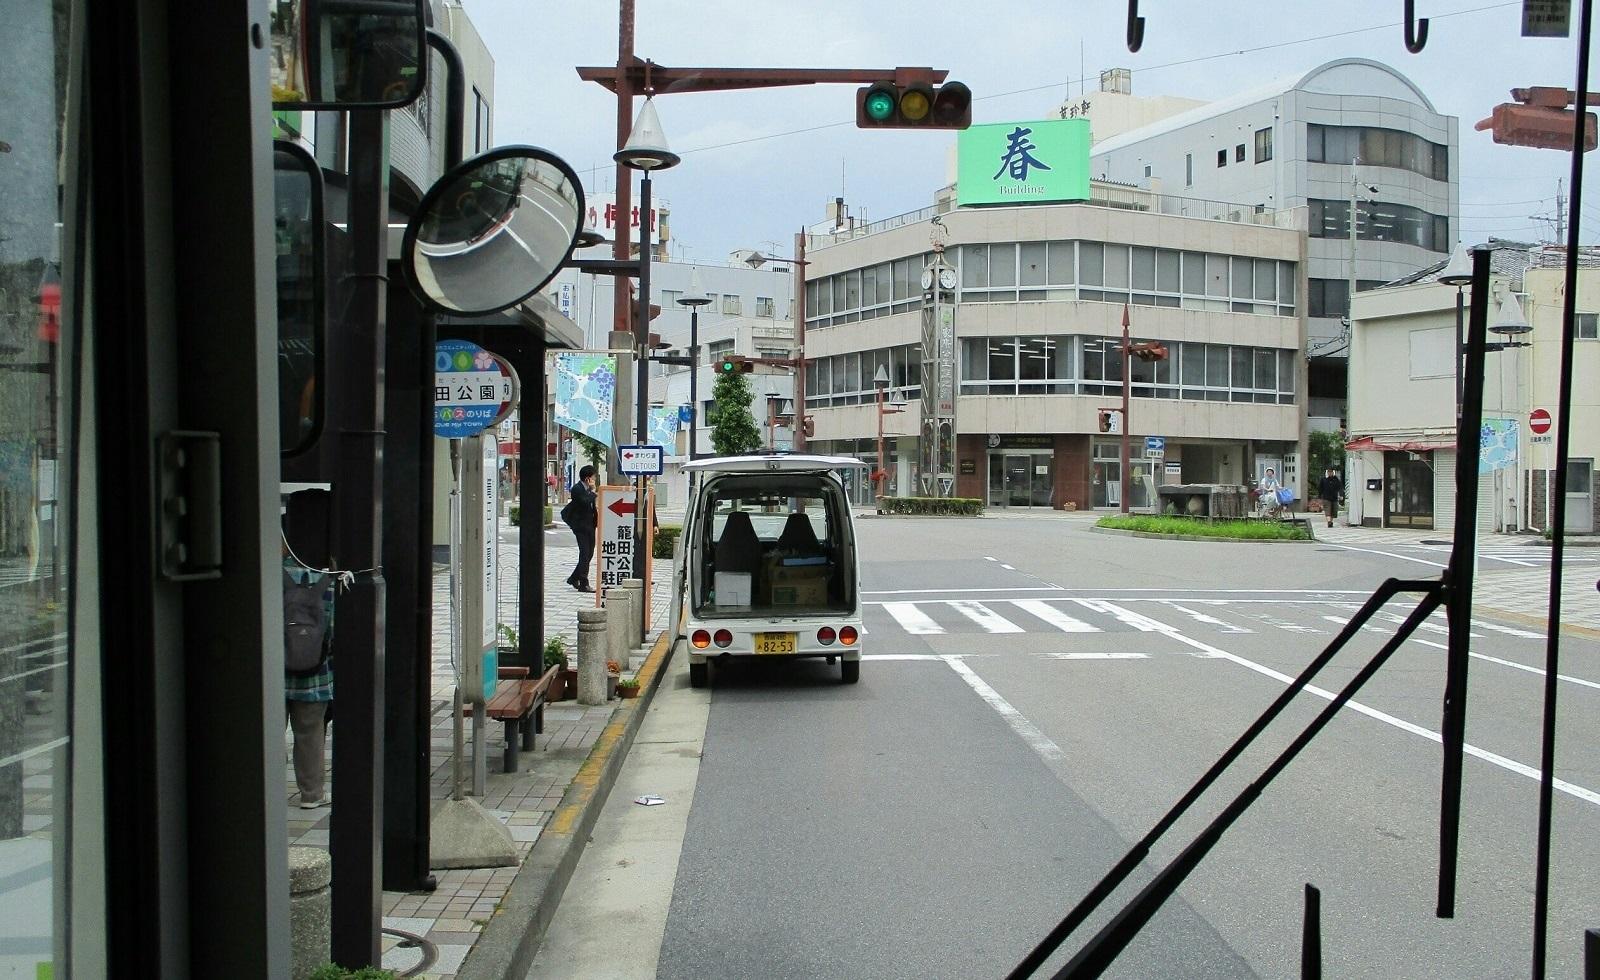 2018.6.21 (18) JRあんじょうえきいきバス - 篭田公園前バス停 1600-980